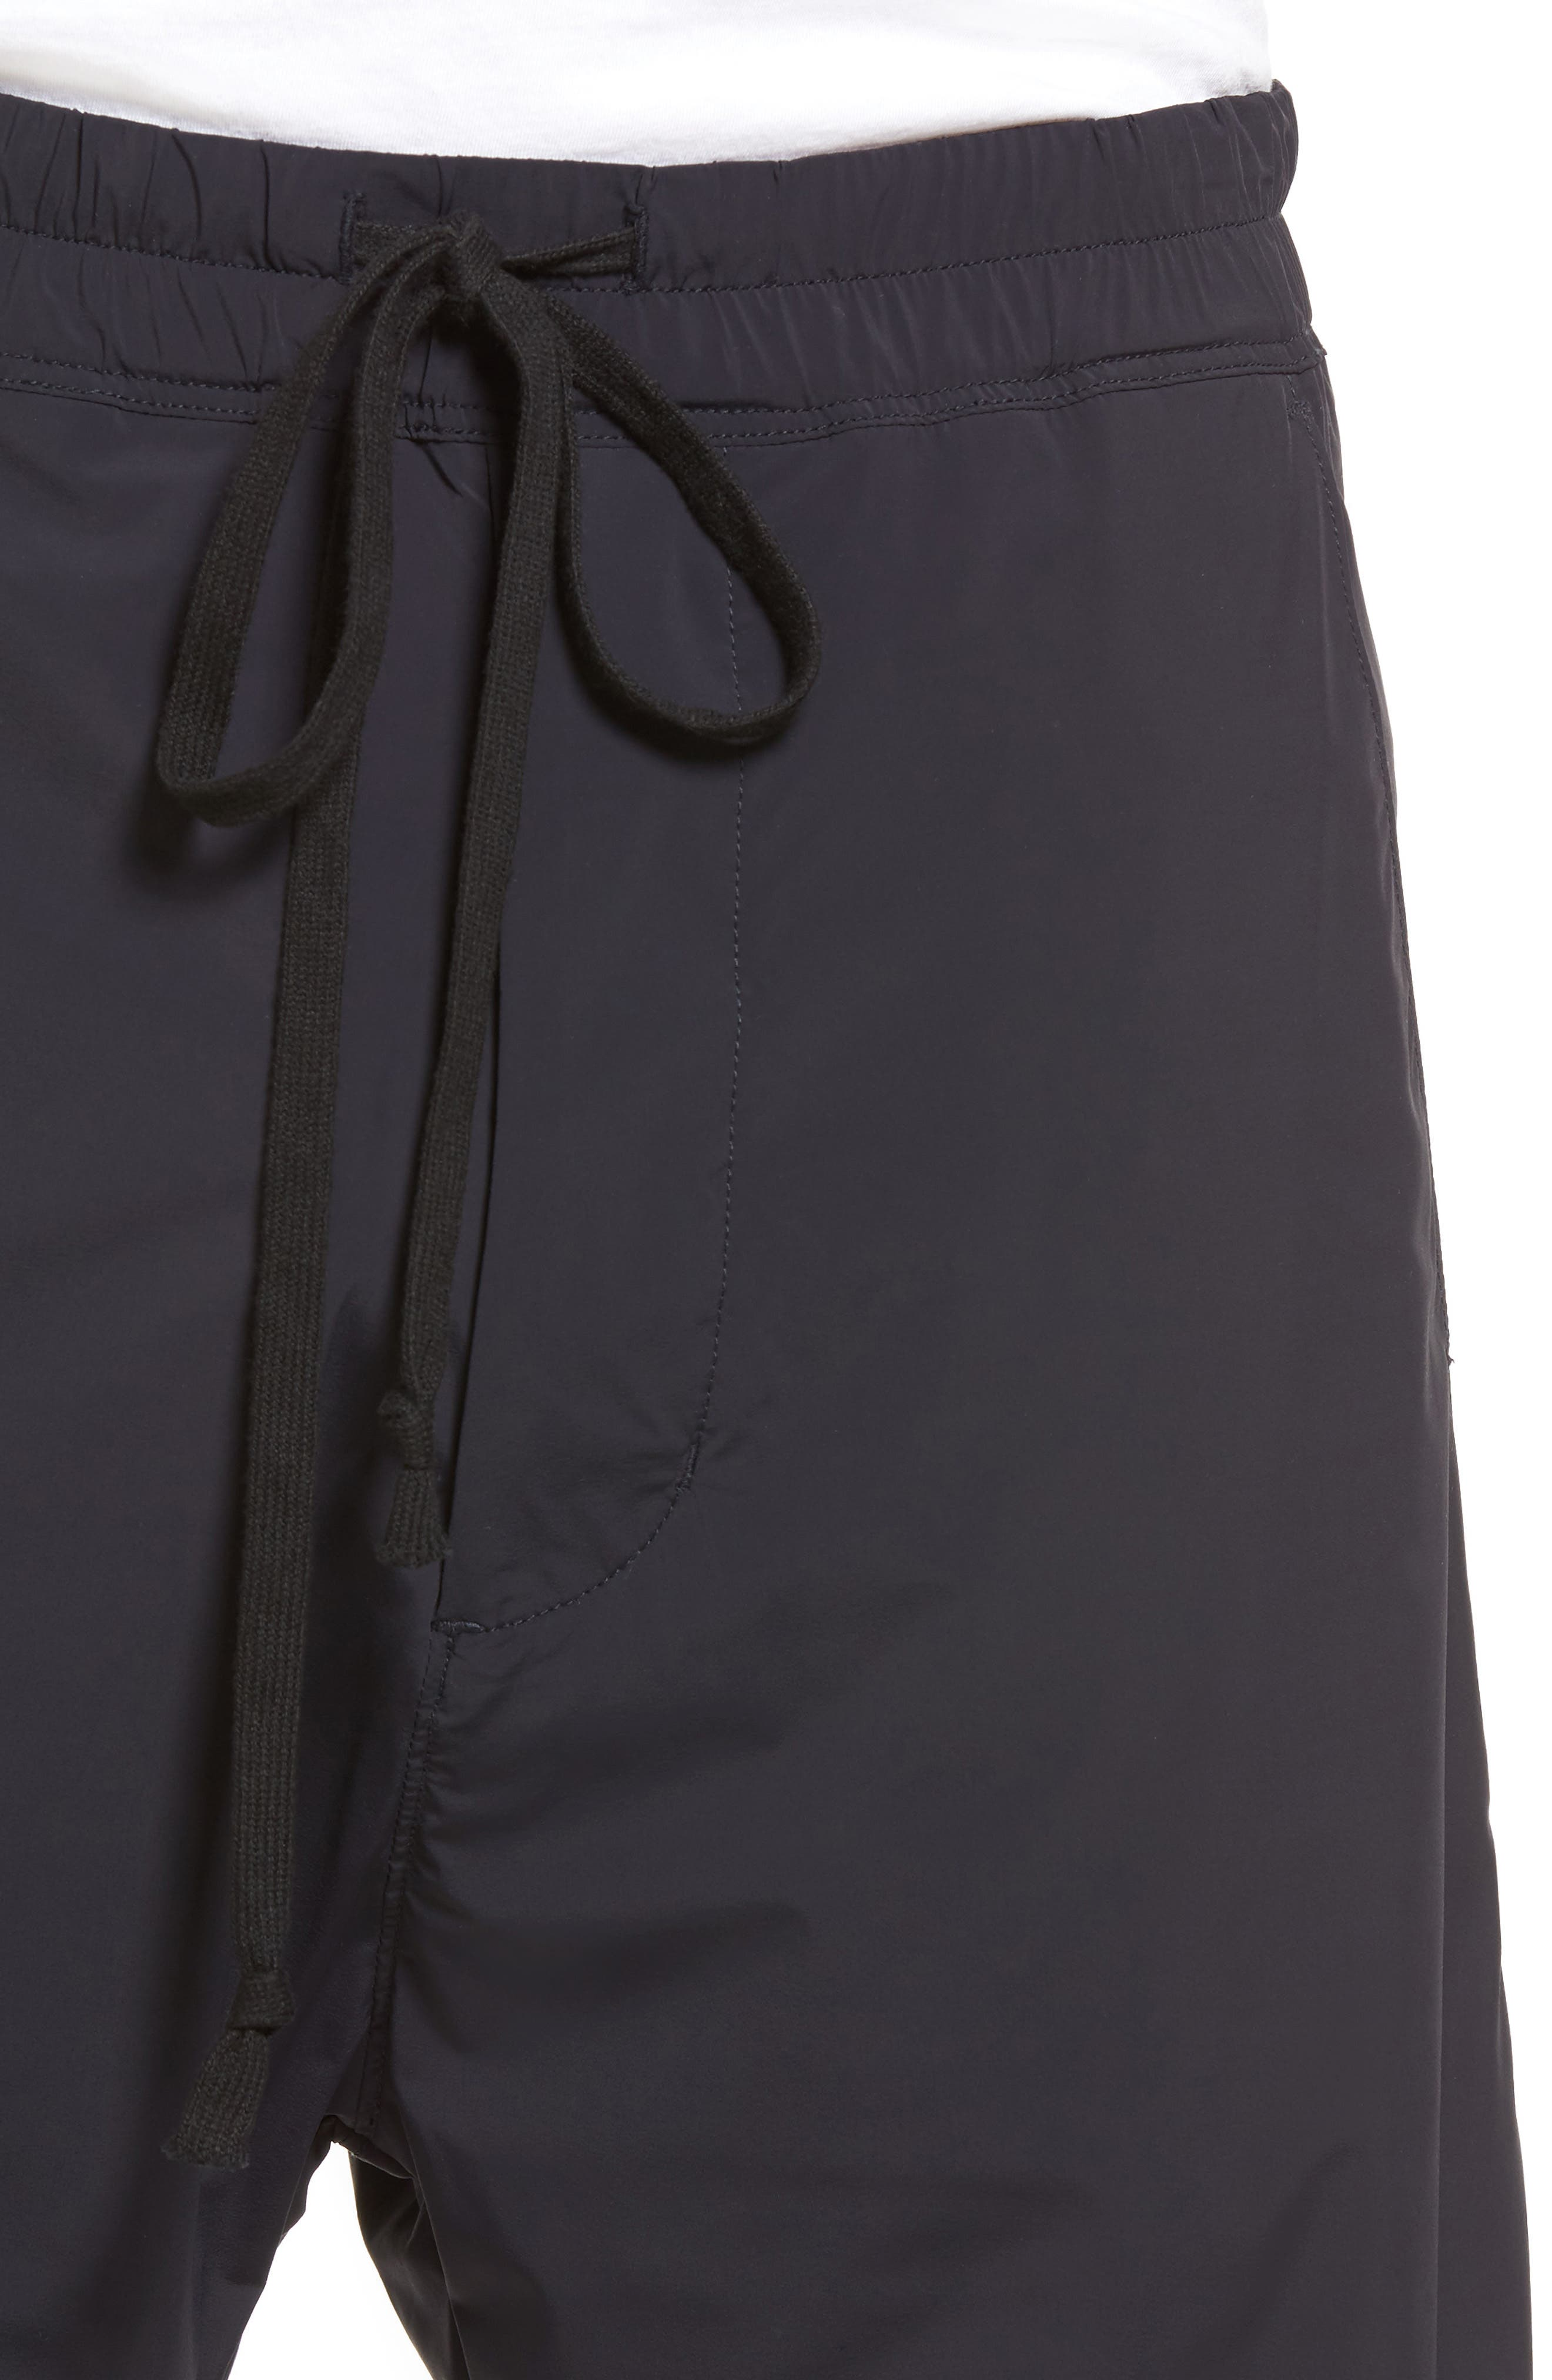 Drop Crotch Shorts,                             Alternate thumbnail 4, color,                             001